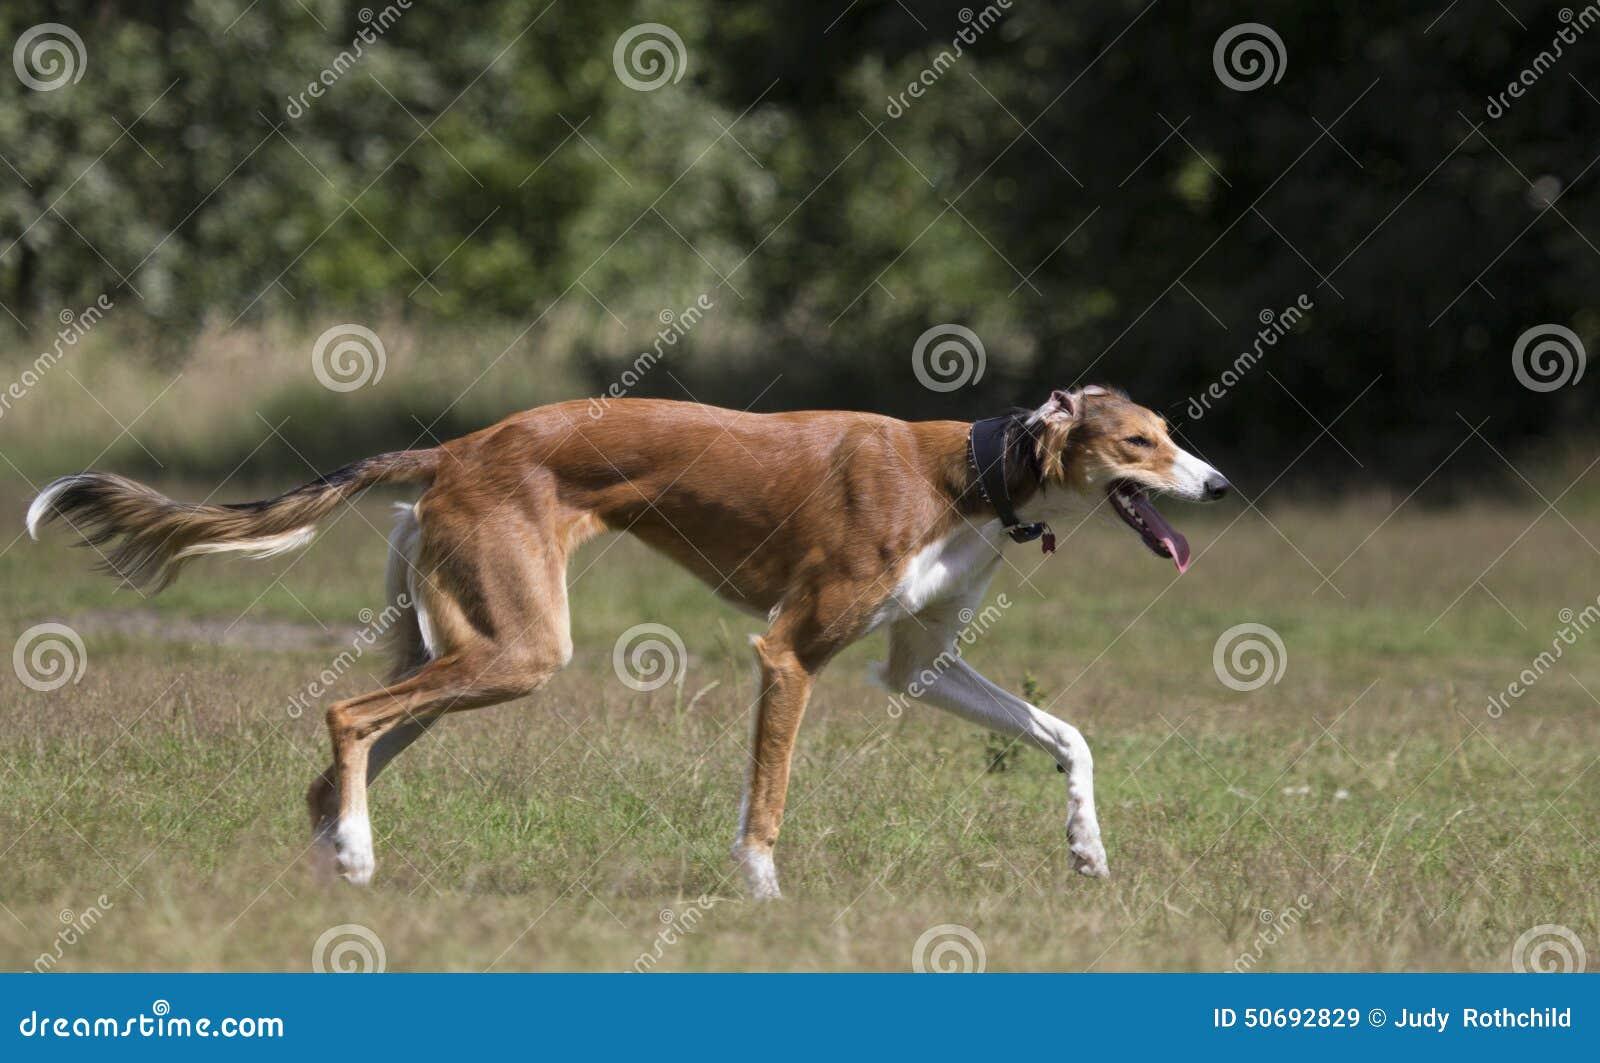 Greyhound Dog Hunting Videos Download